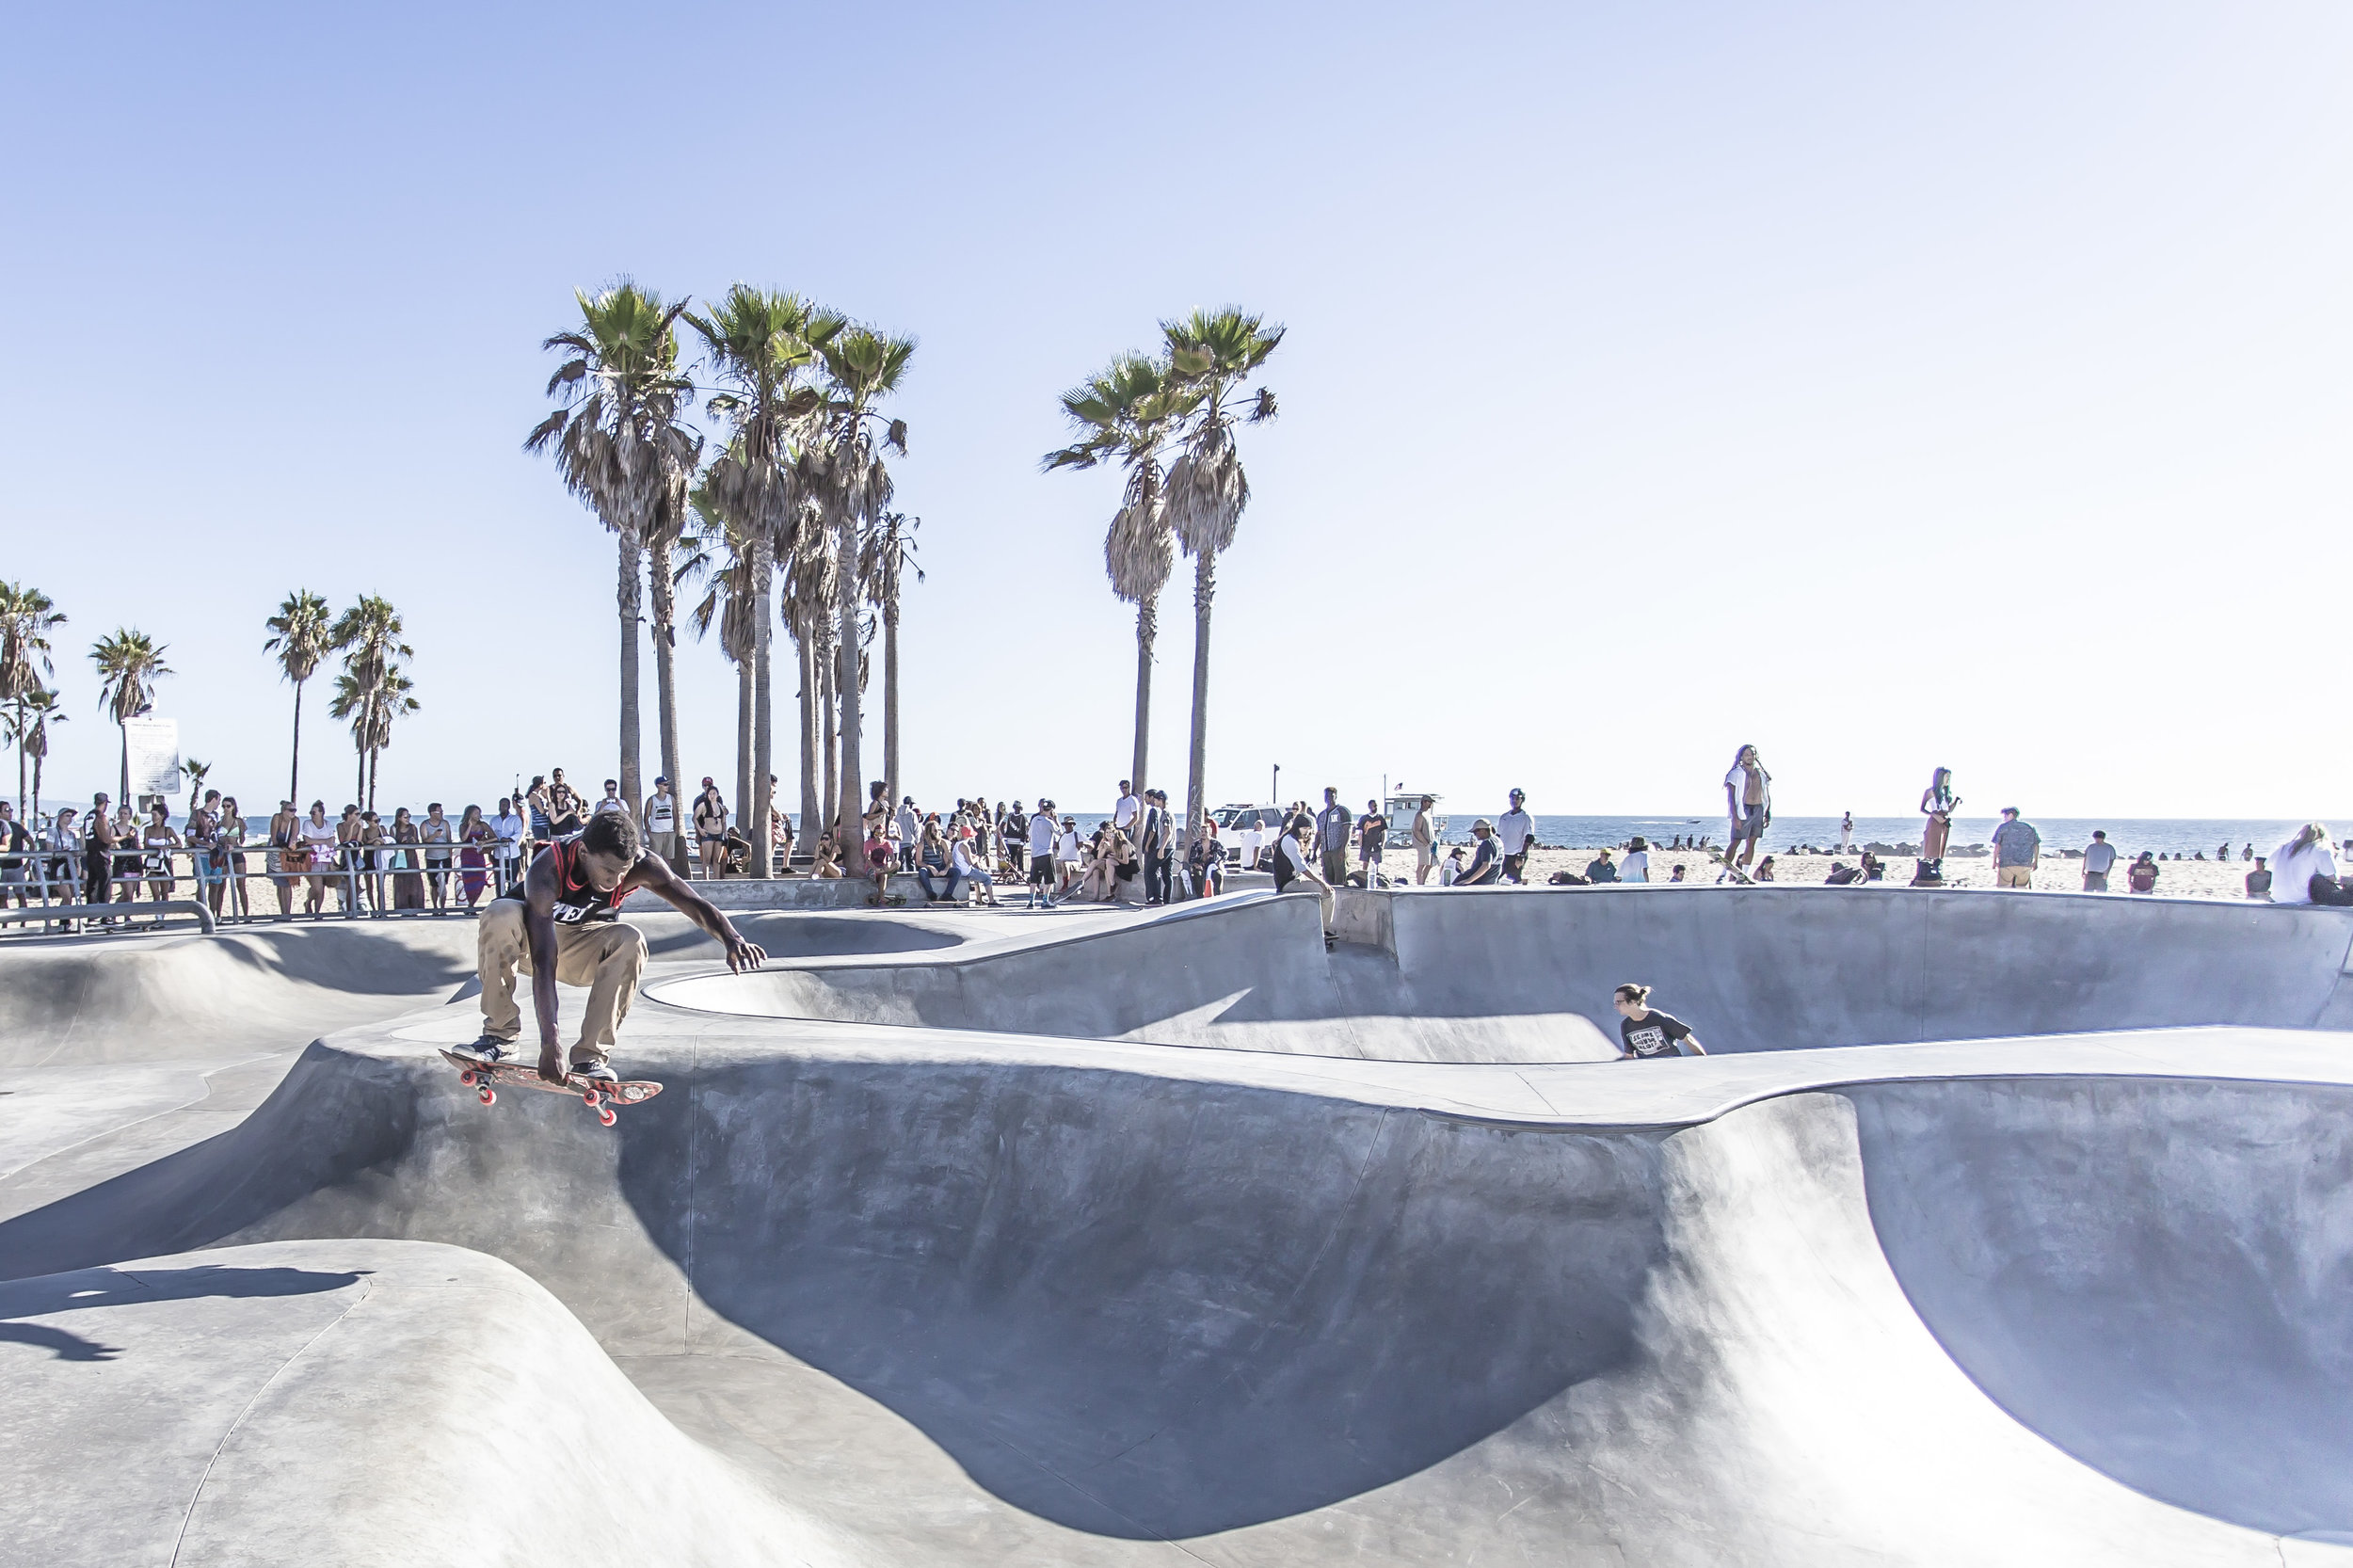 beach-skateboard-park.jpeg